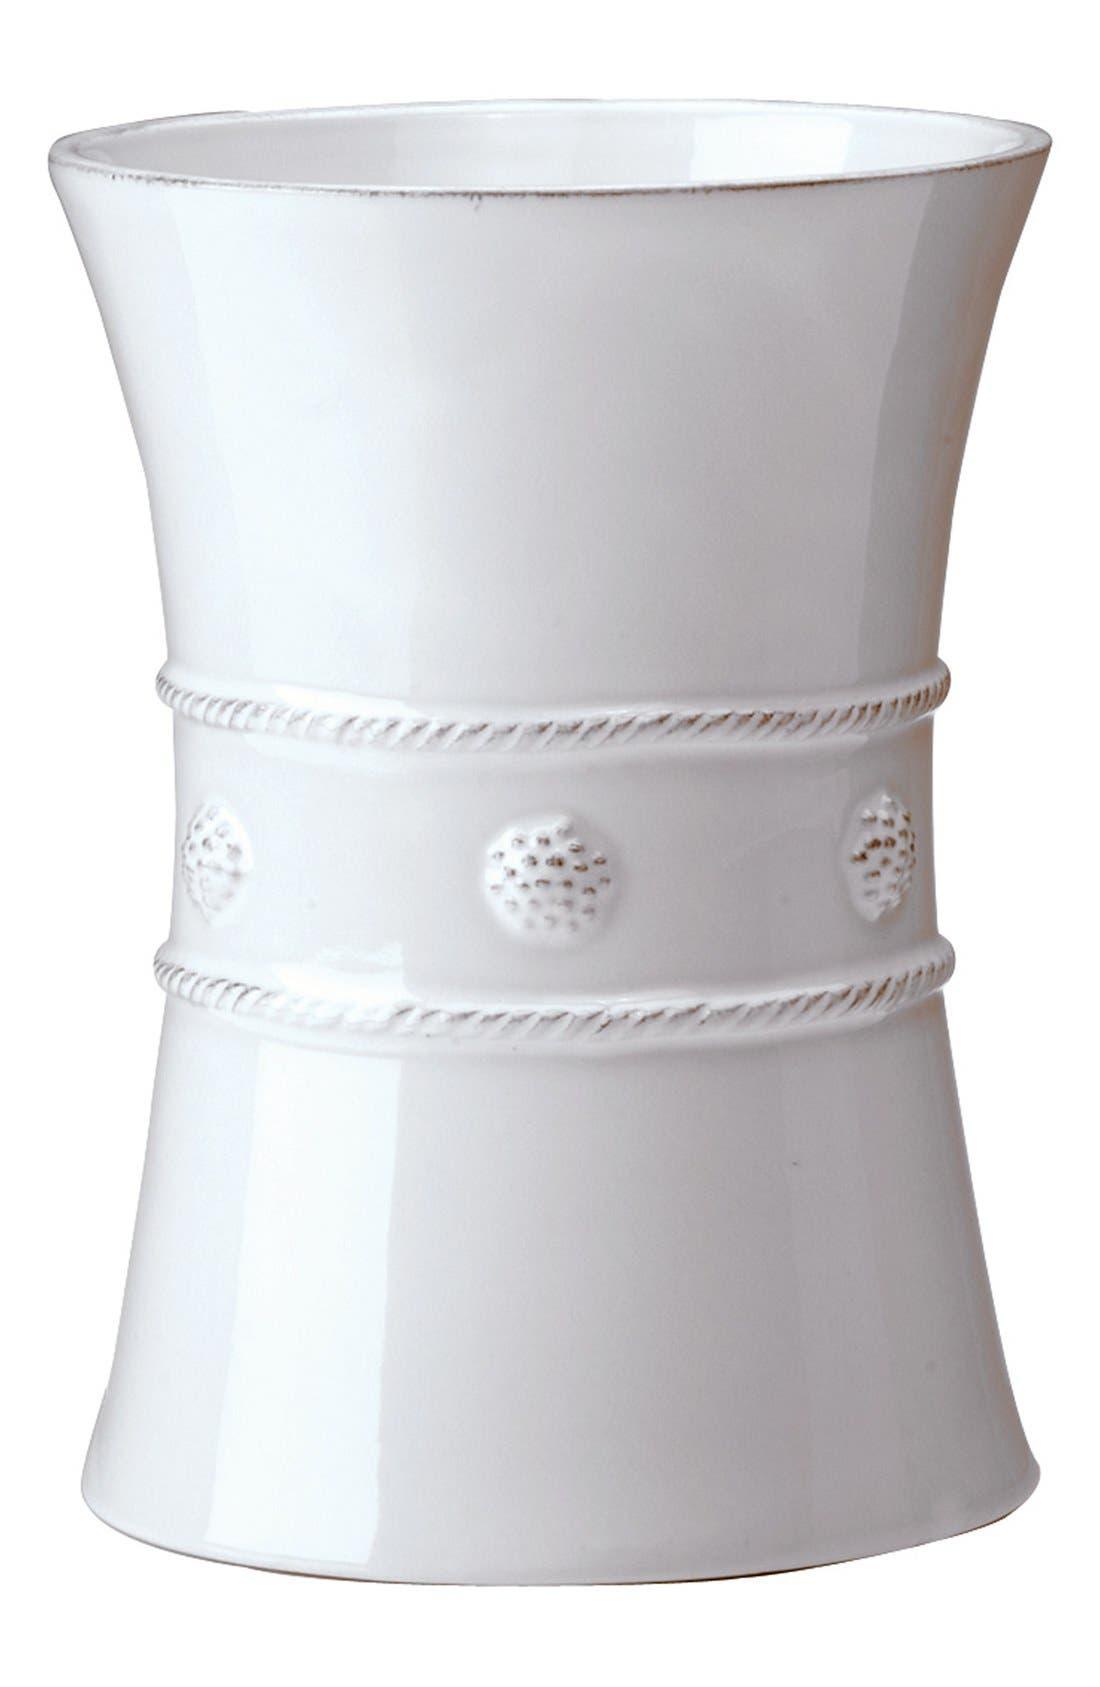 Main Image - Juliska'Berry and Thread' Ceramic Utensil Crock